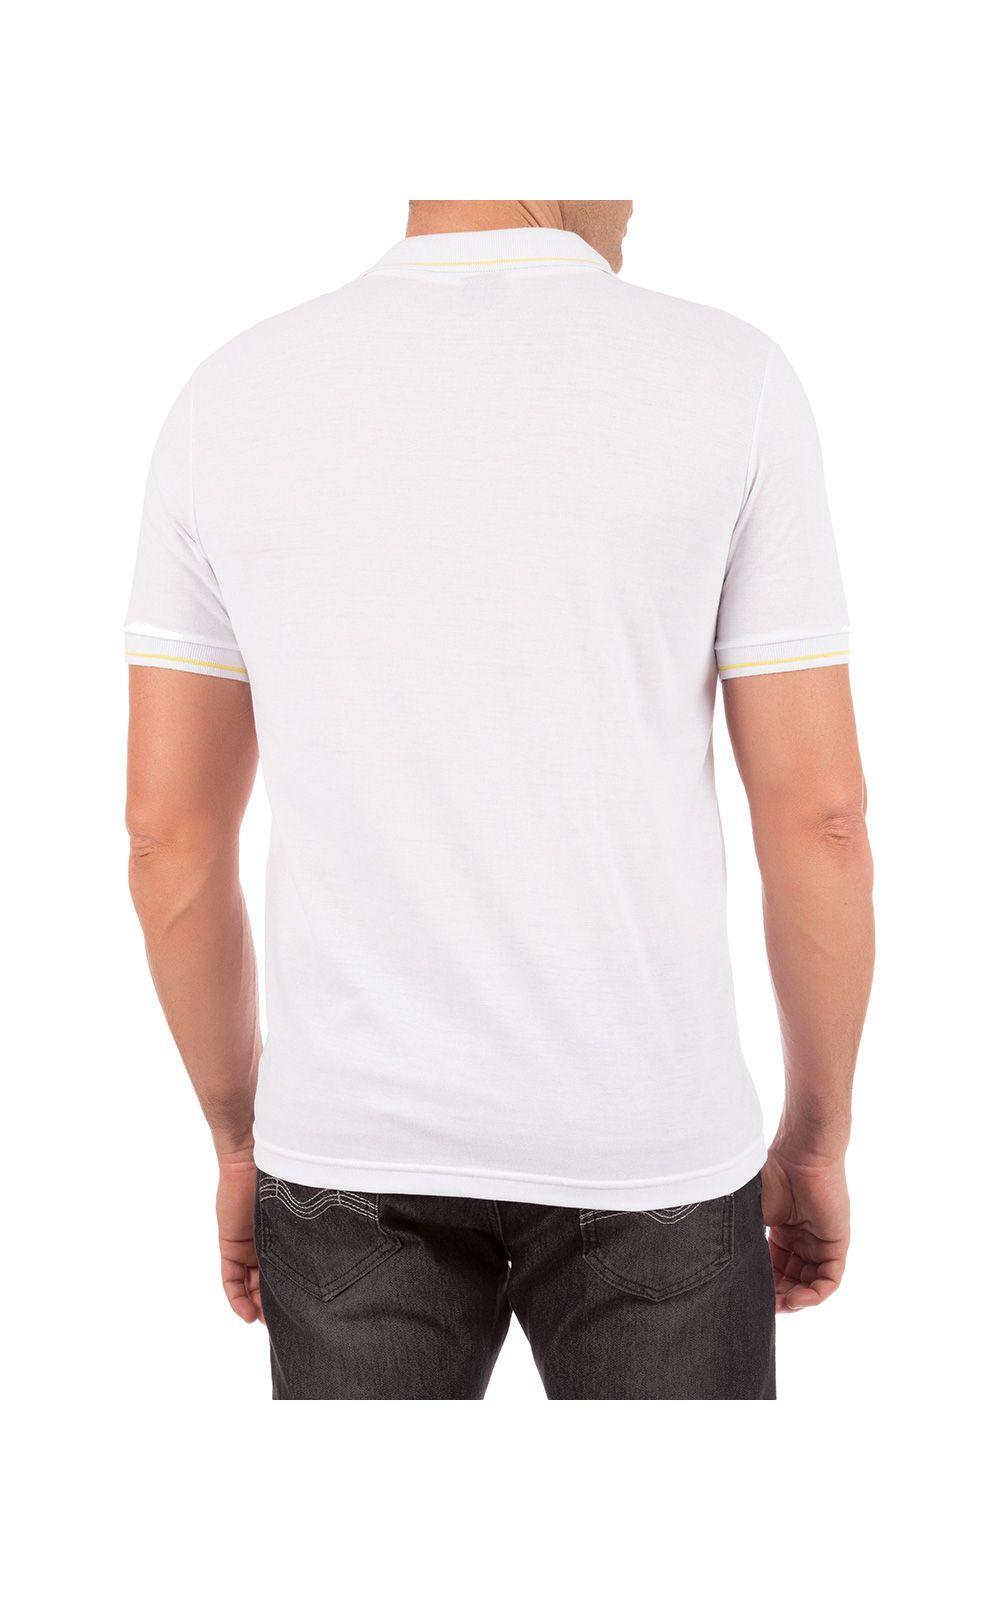 Foto 2 - Camisa Polo Masculina Branca Detalhada